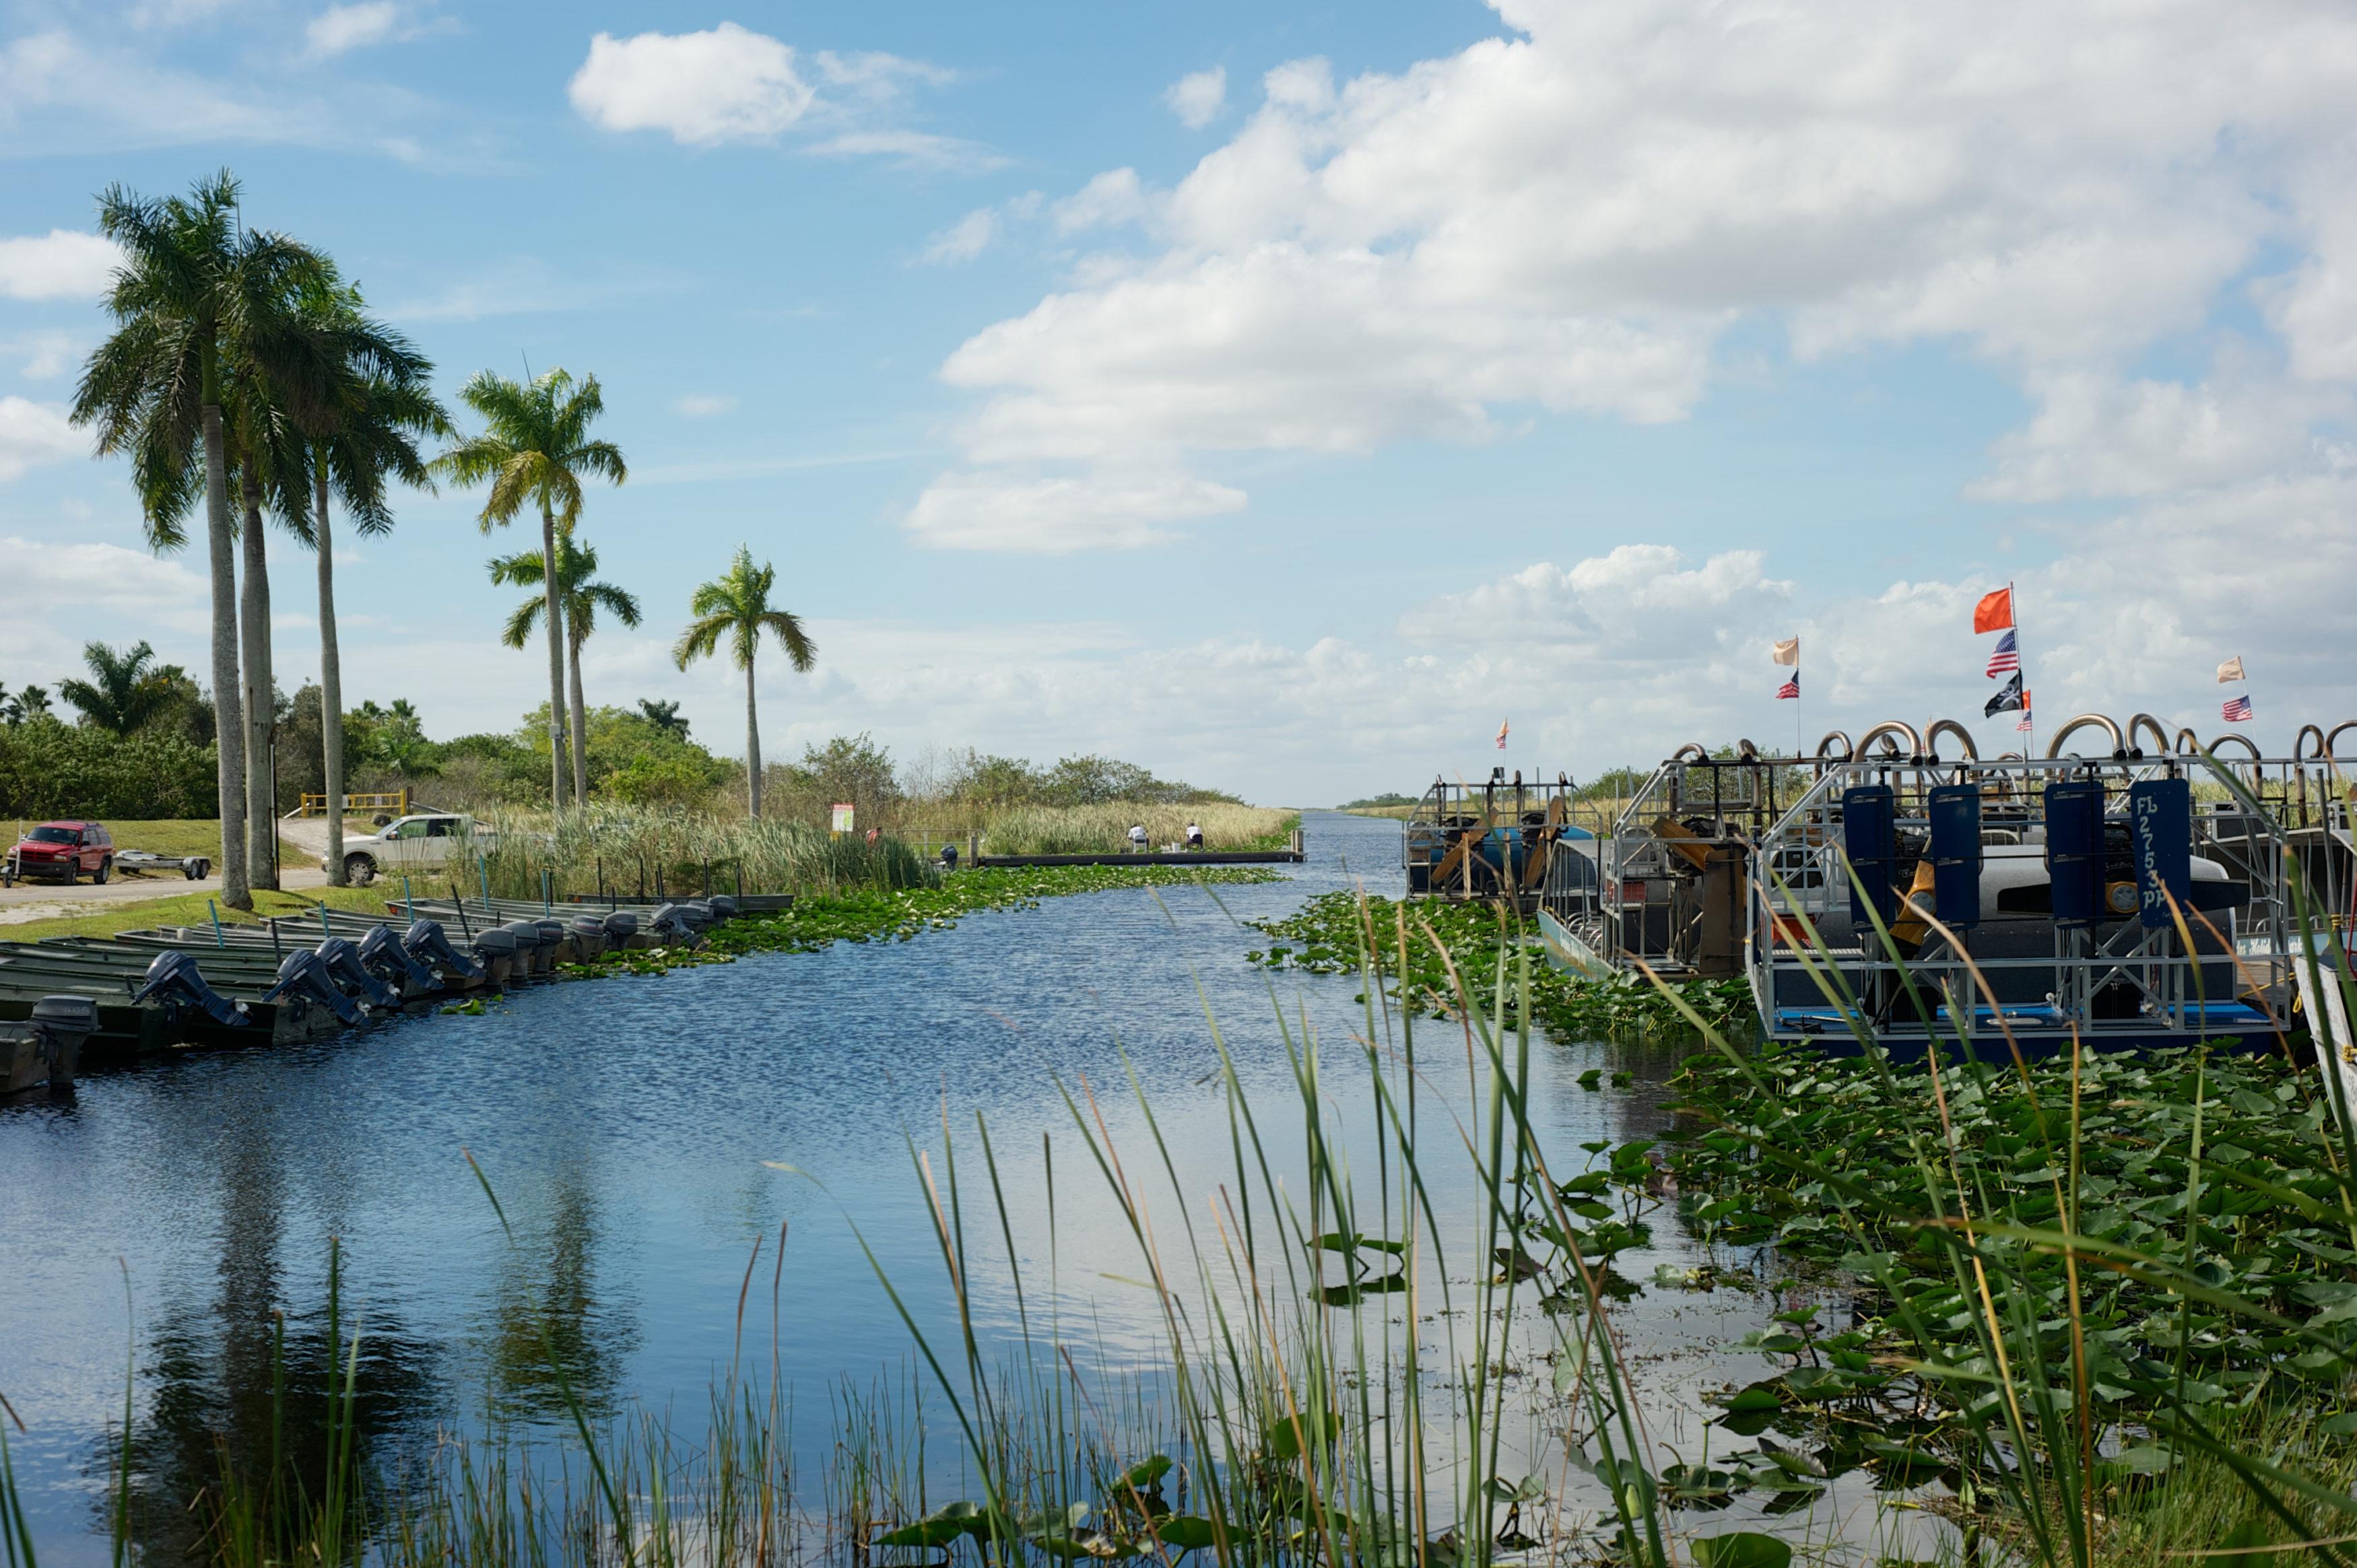 Everglades-3500x2329.jpeg